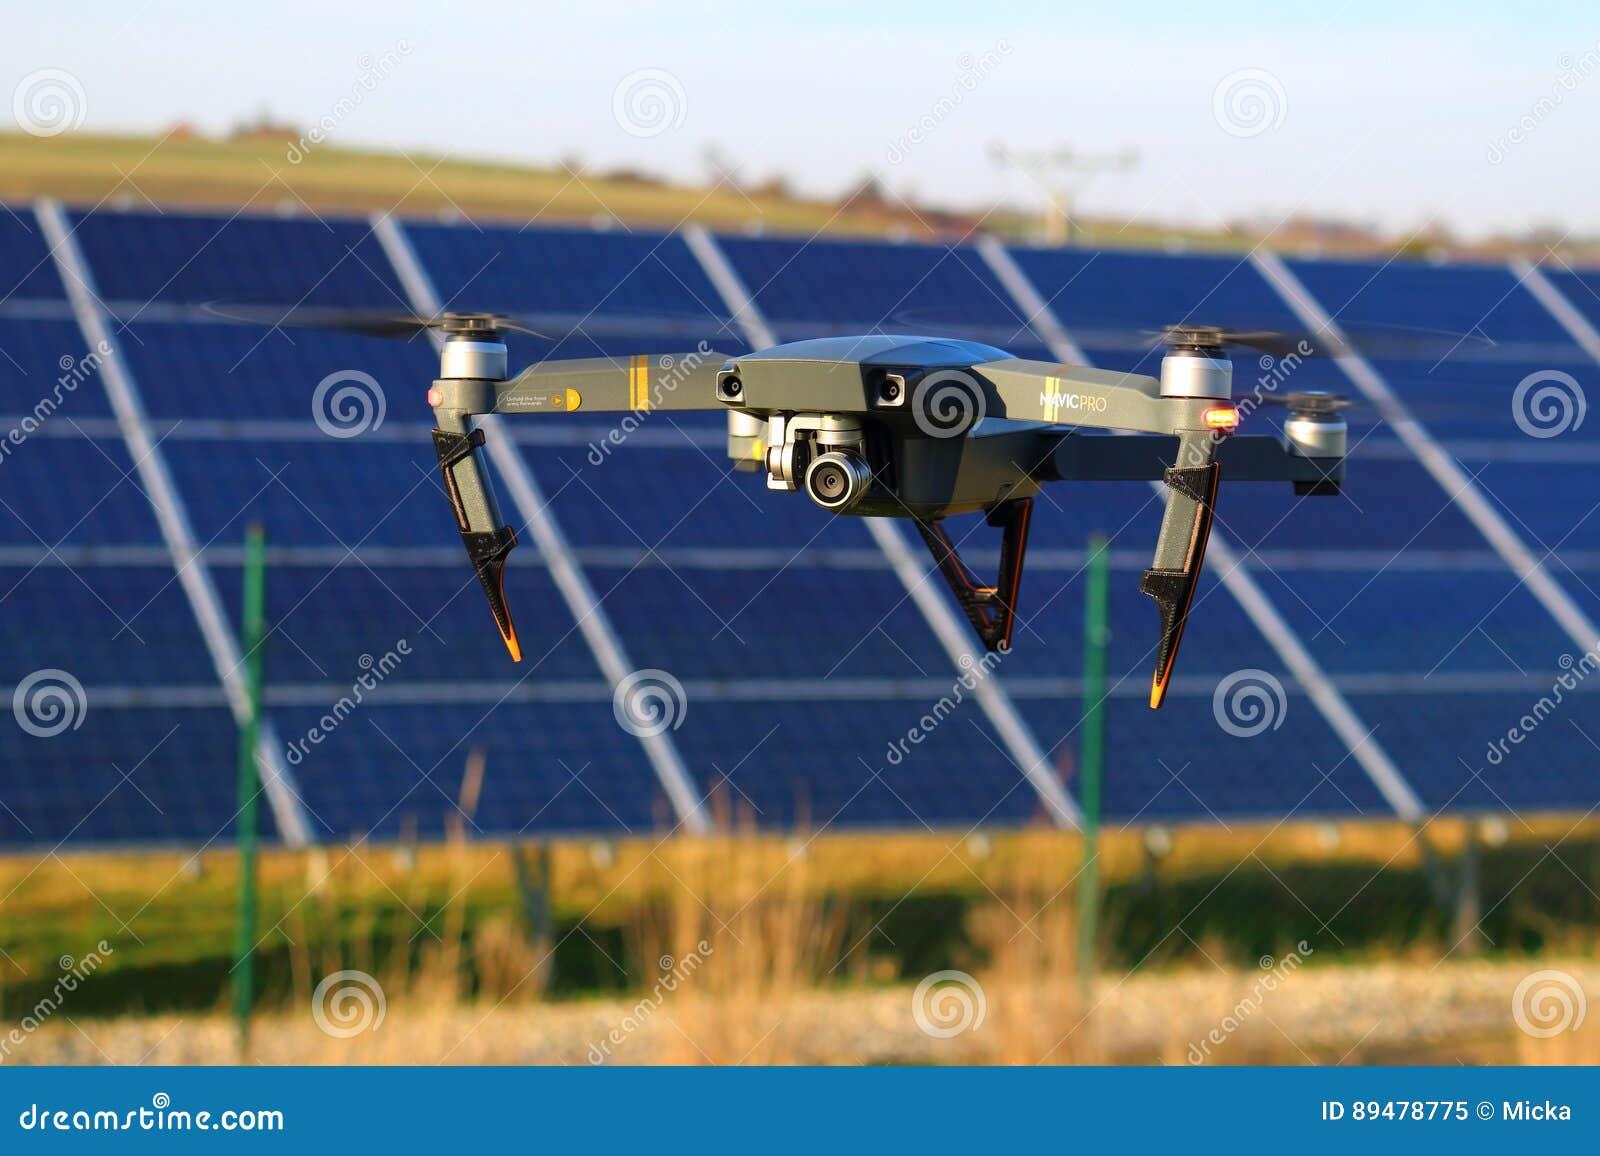 DJI Mavic Pro Drone Above Solar Panels Editorial Image